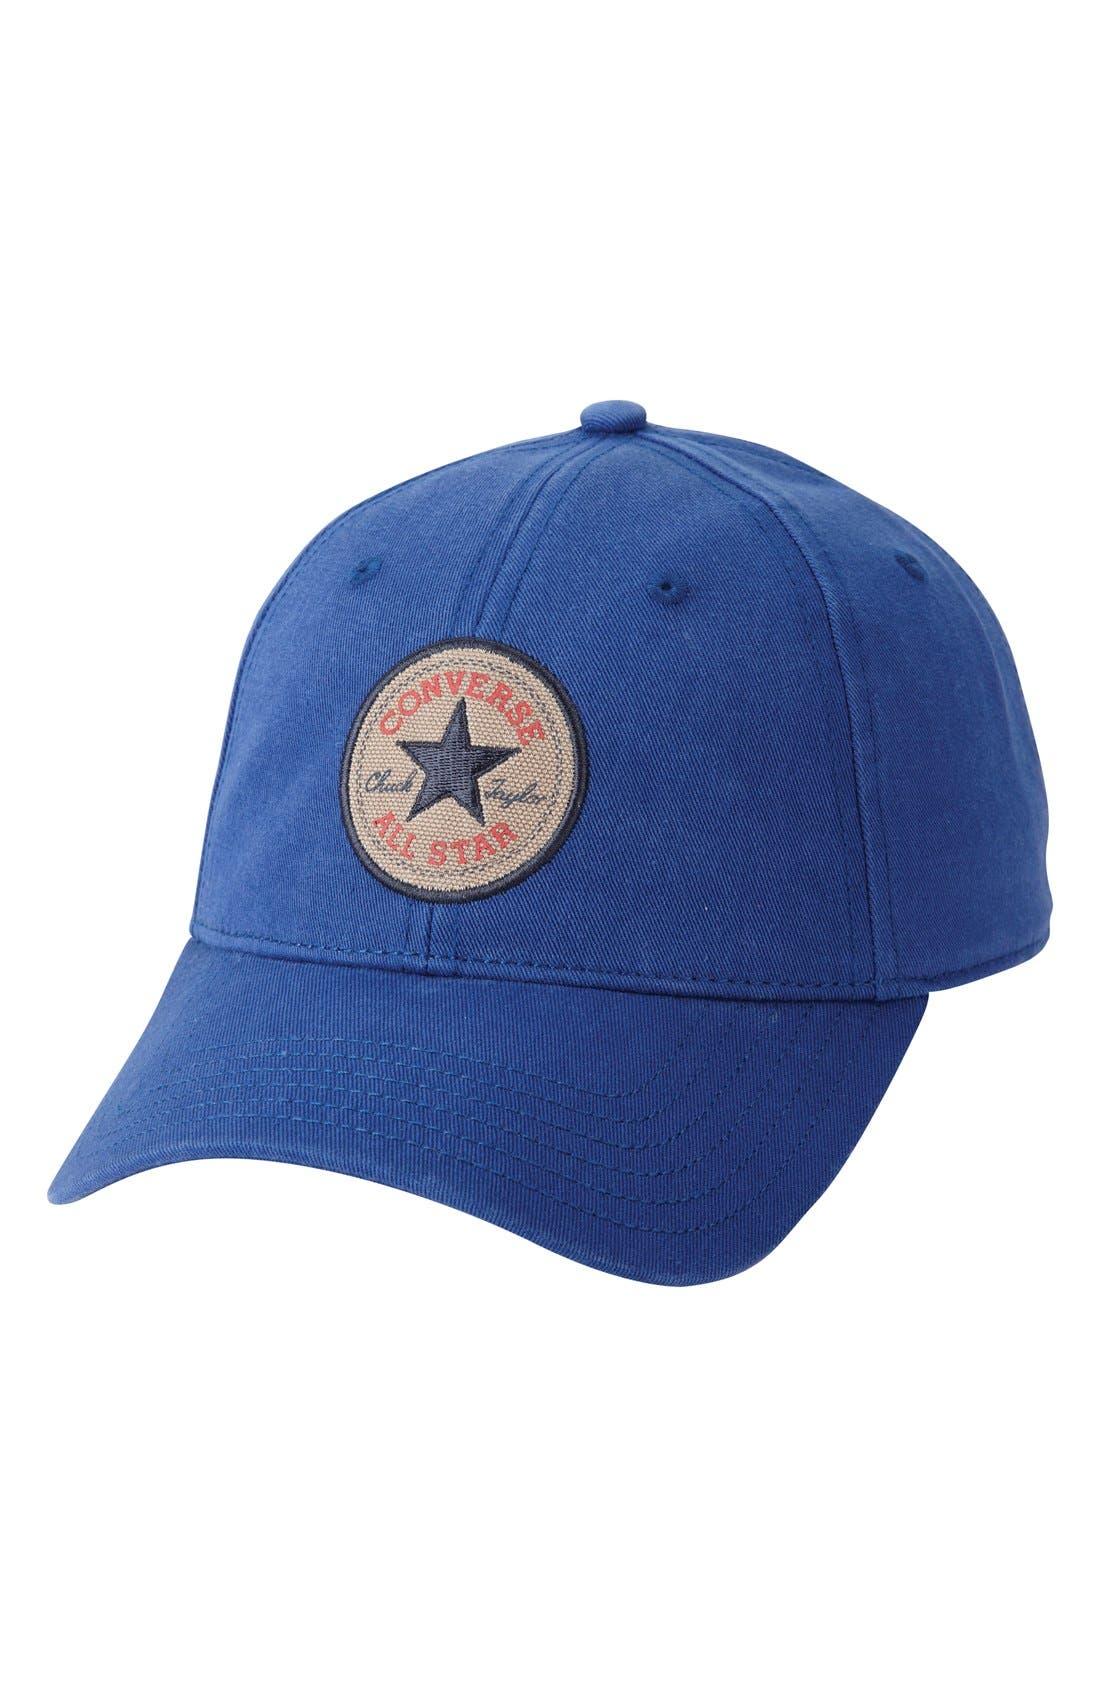 Main Image - Converse 'Core' Twill Ball Cap